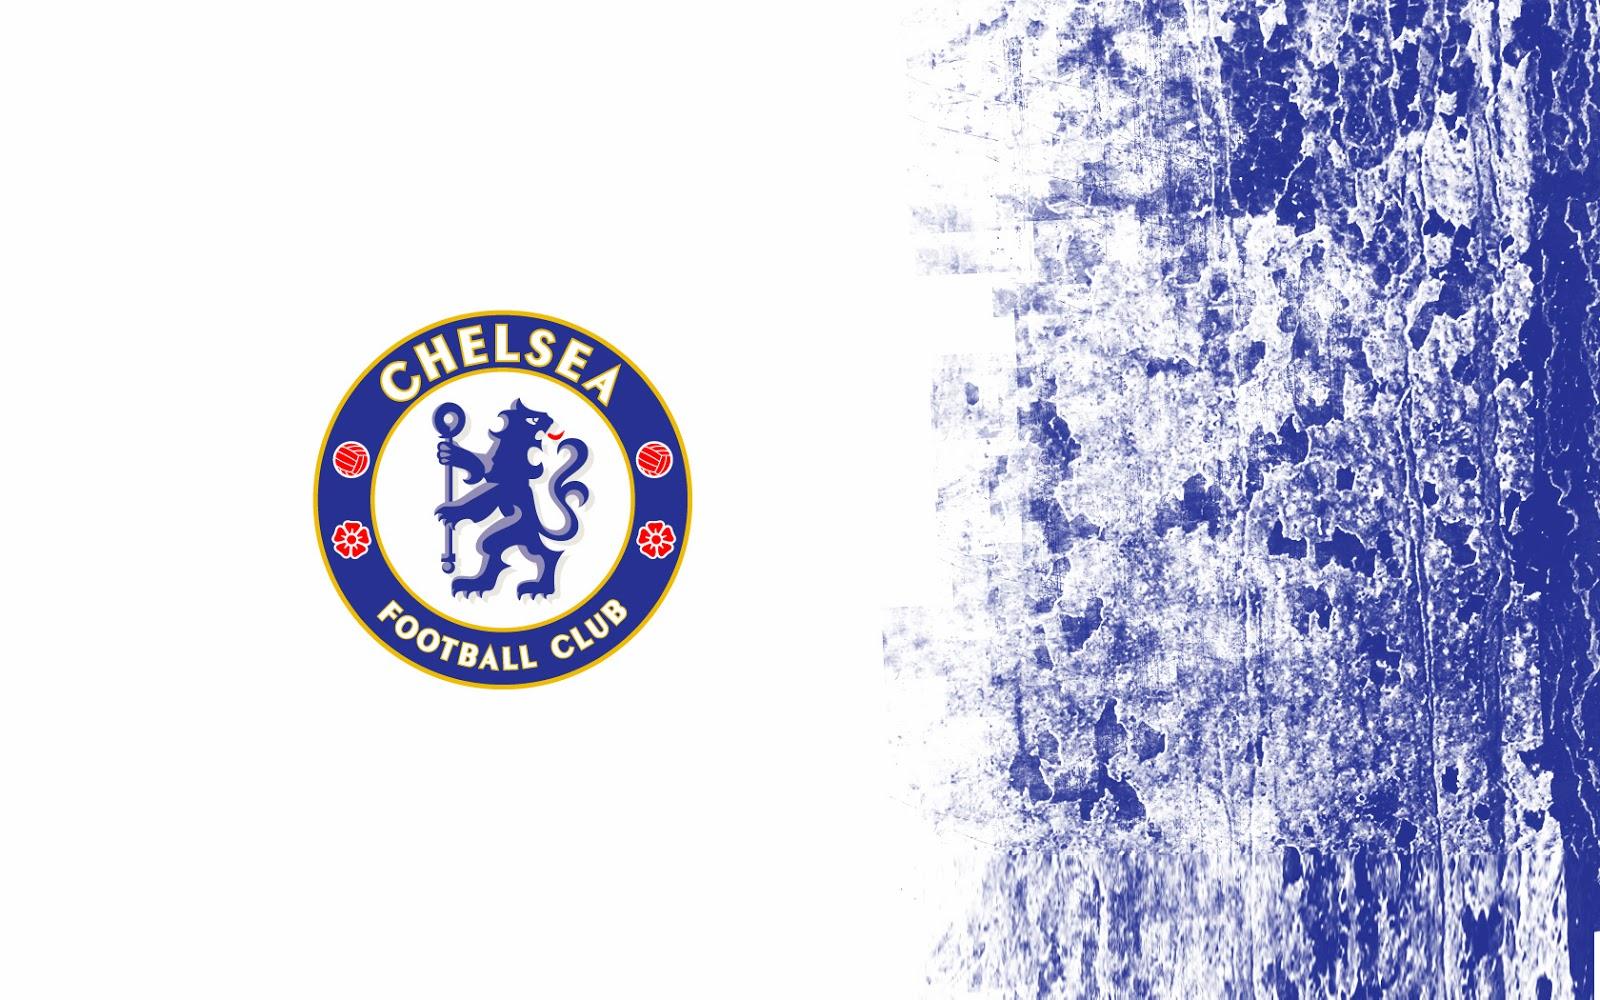 Chelsea Fc Wallpapers   beautiful desktop wallpapers 2014 1600x1000